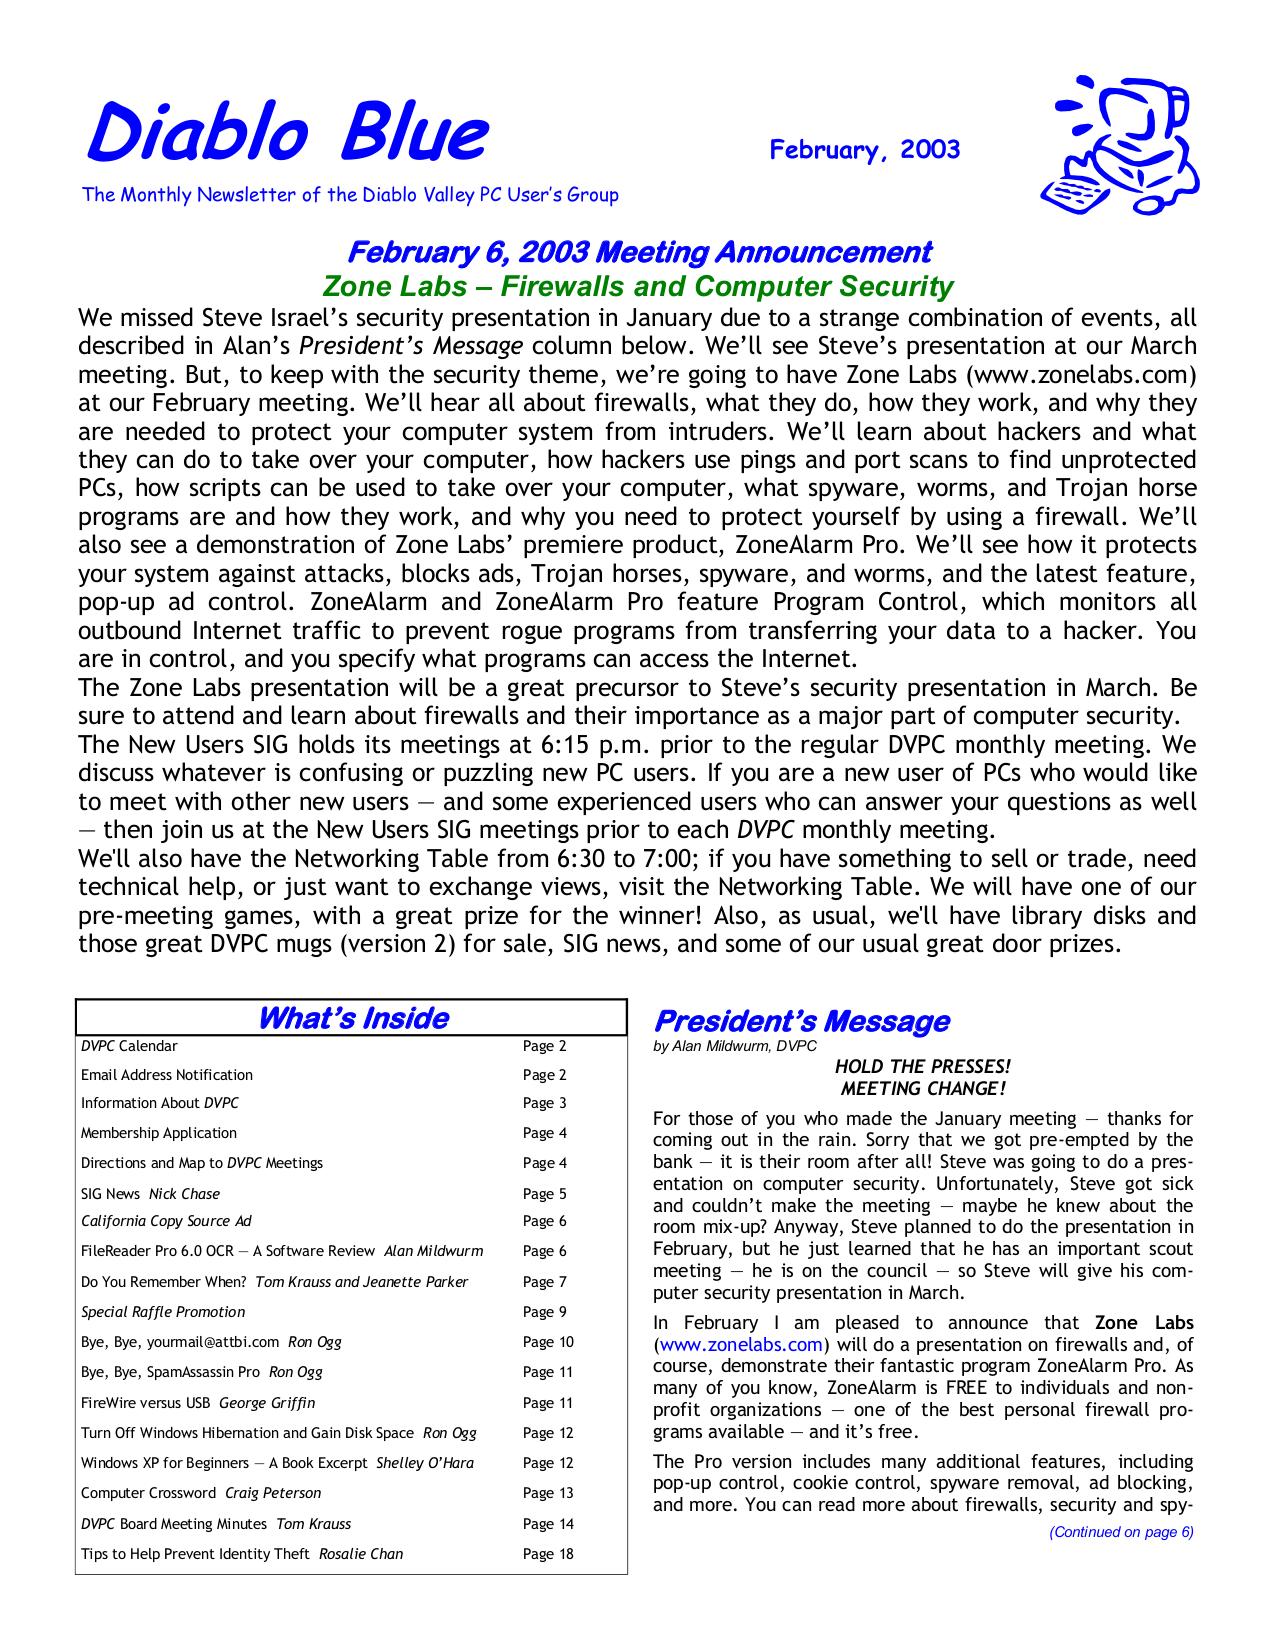 pdf for Umax Scanner AstraNET e3420 manual